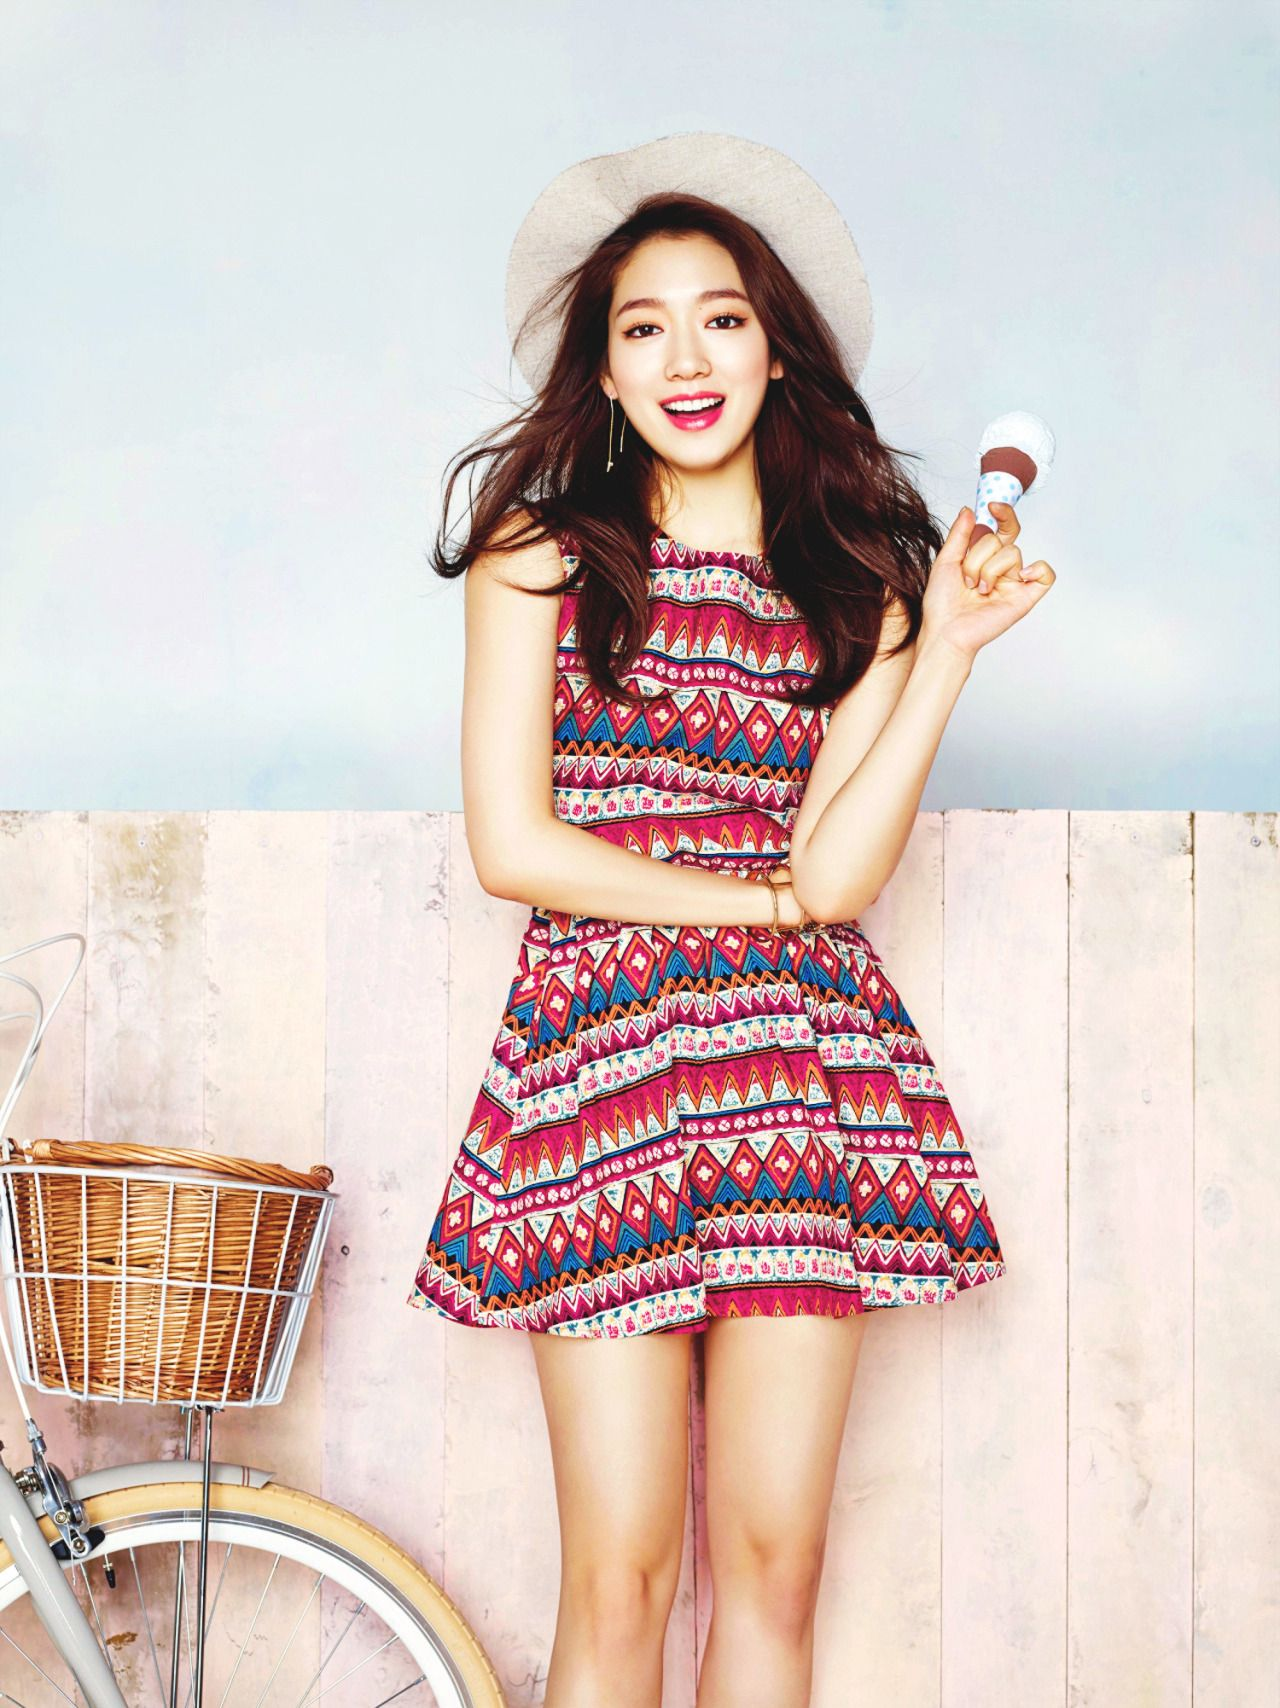 Park Shin Hye H Style 2015 Park Shin Hye Pinterest Park Shin Hye And Korean